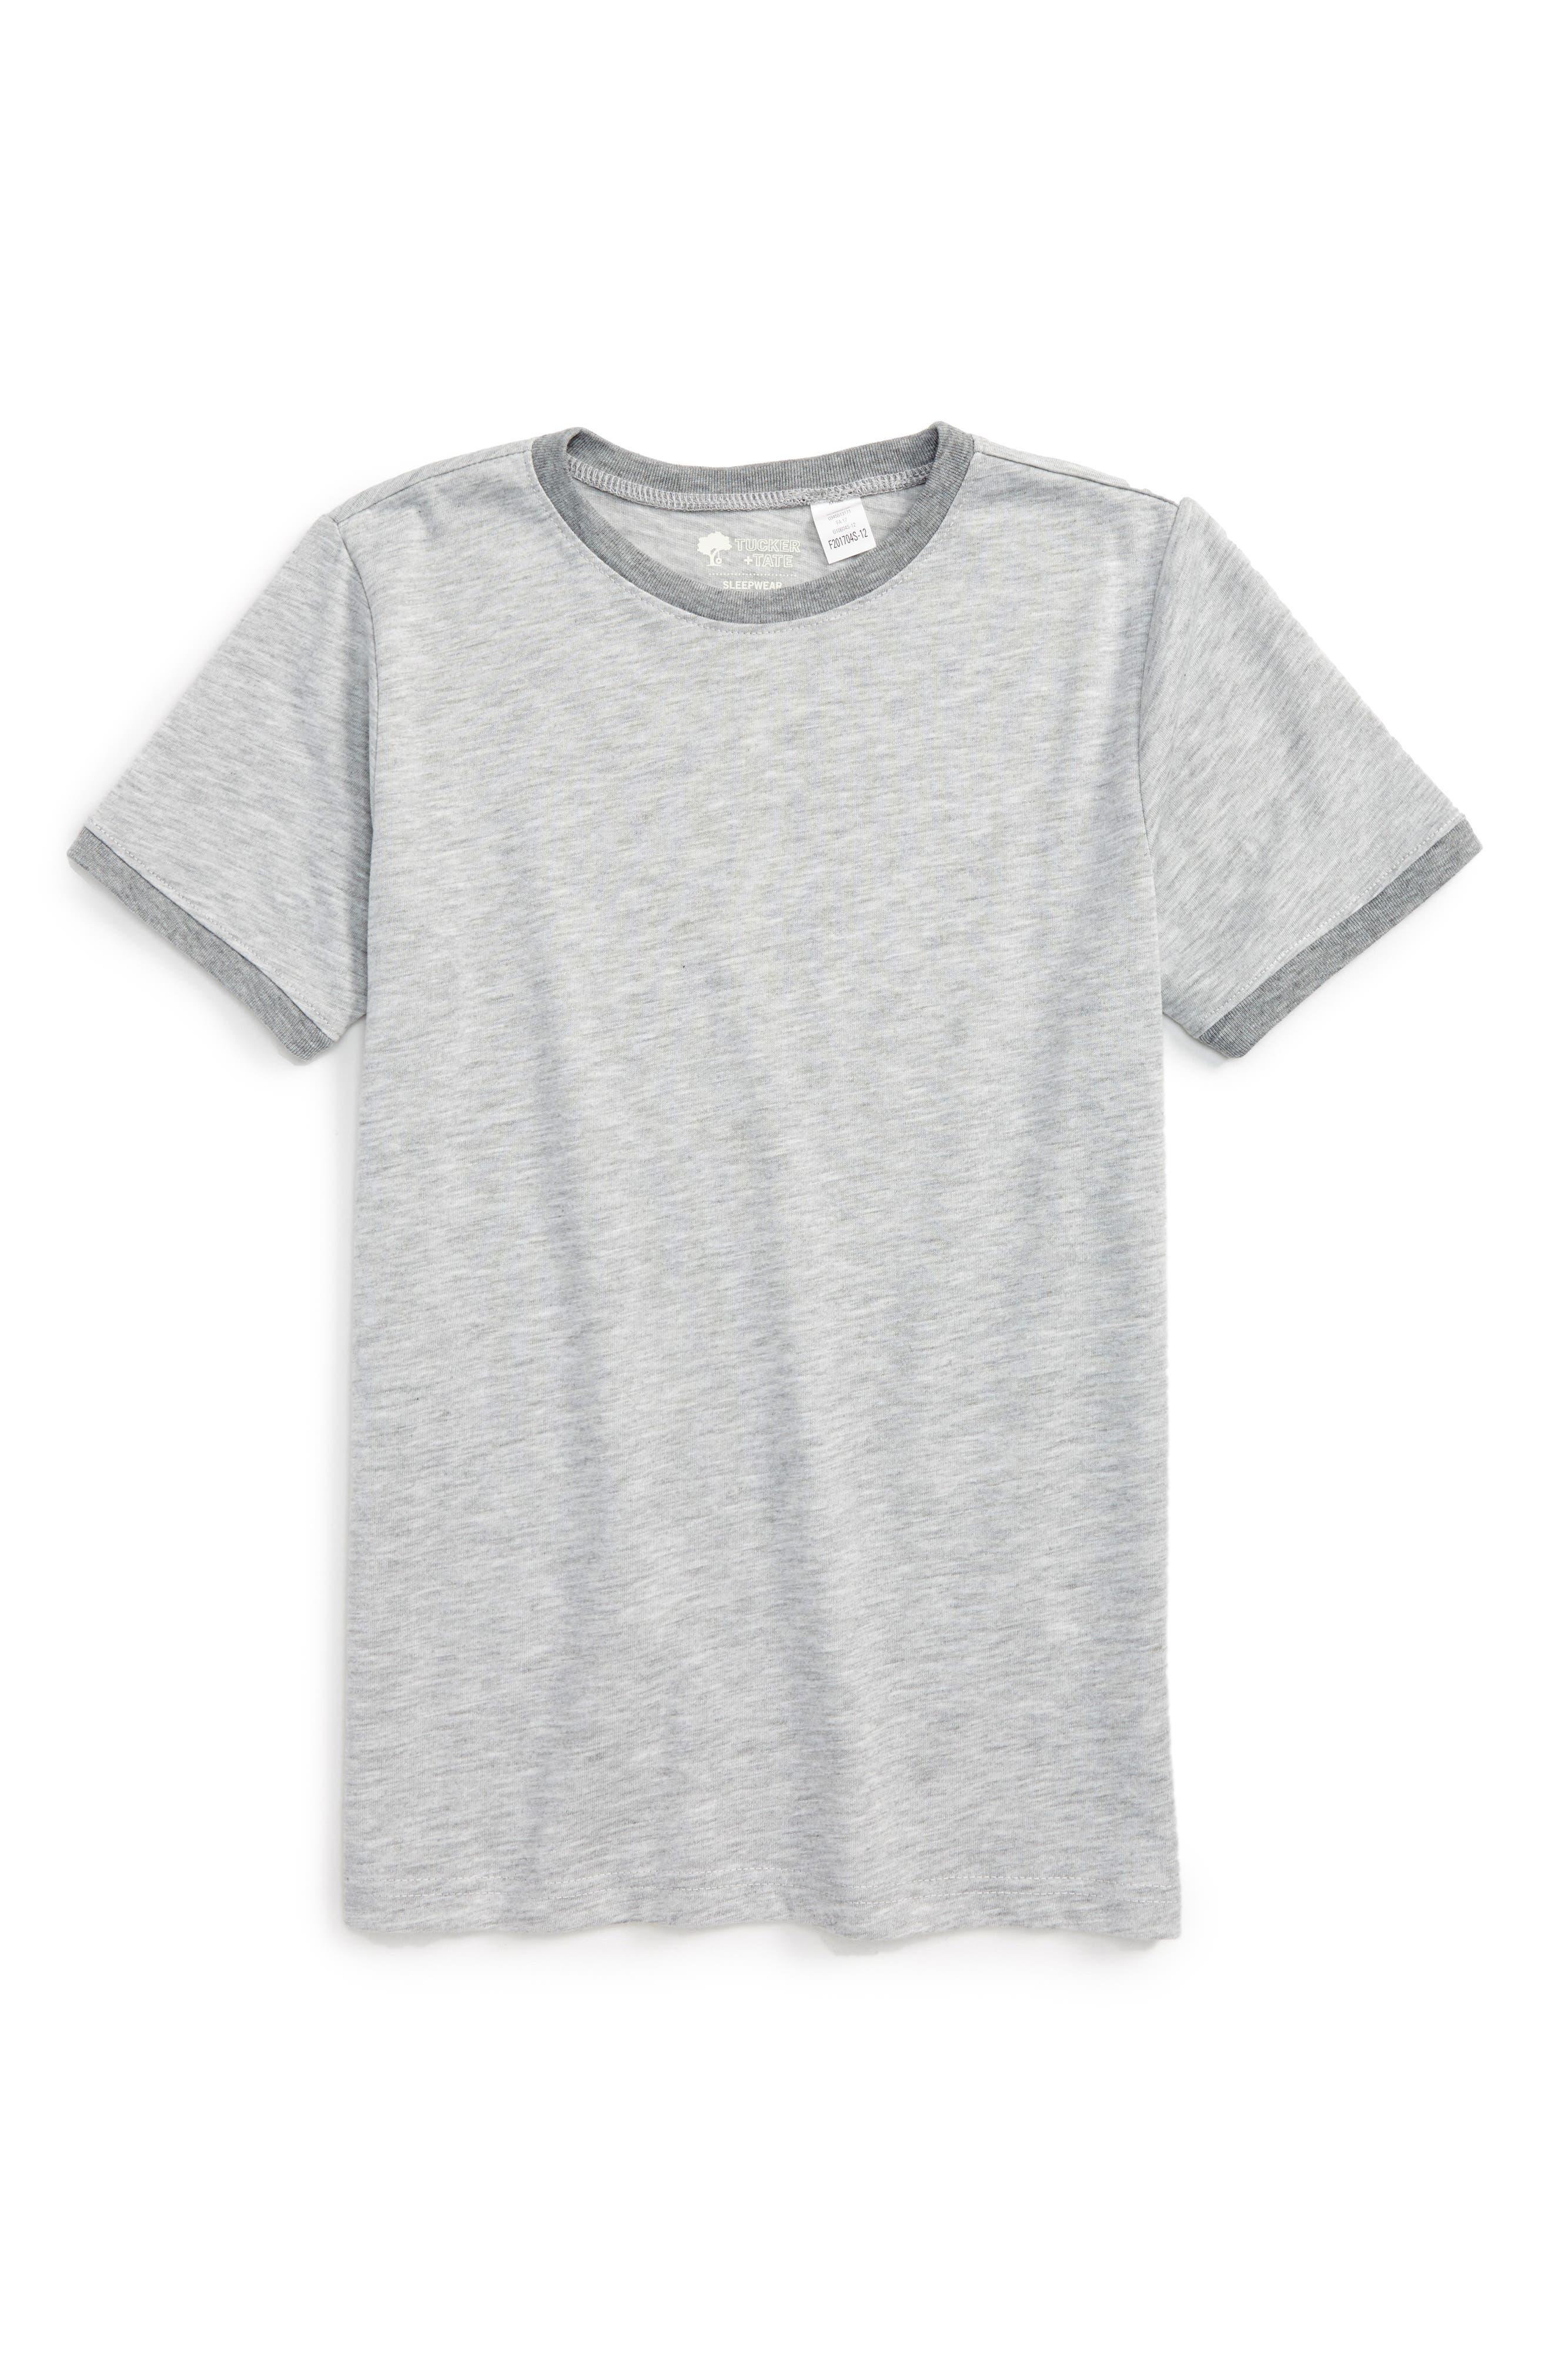 Tucker + Tate Sleep T-Shirt (Little Boys & Big Boys)